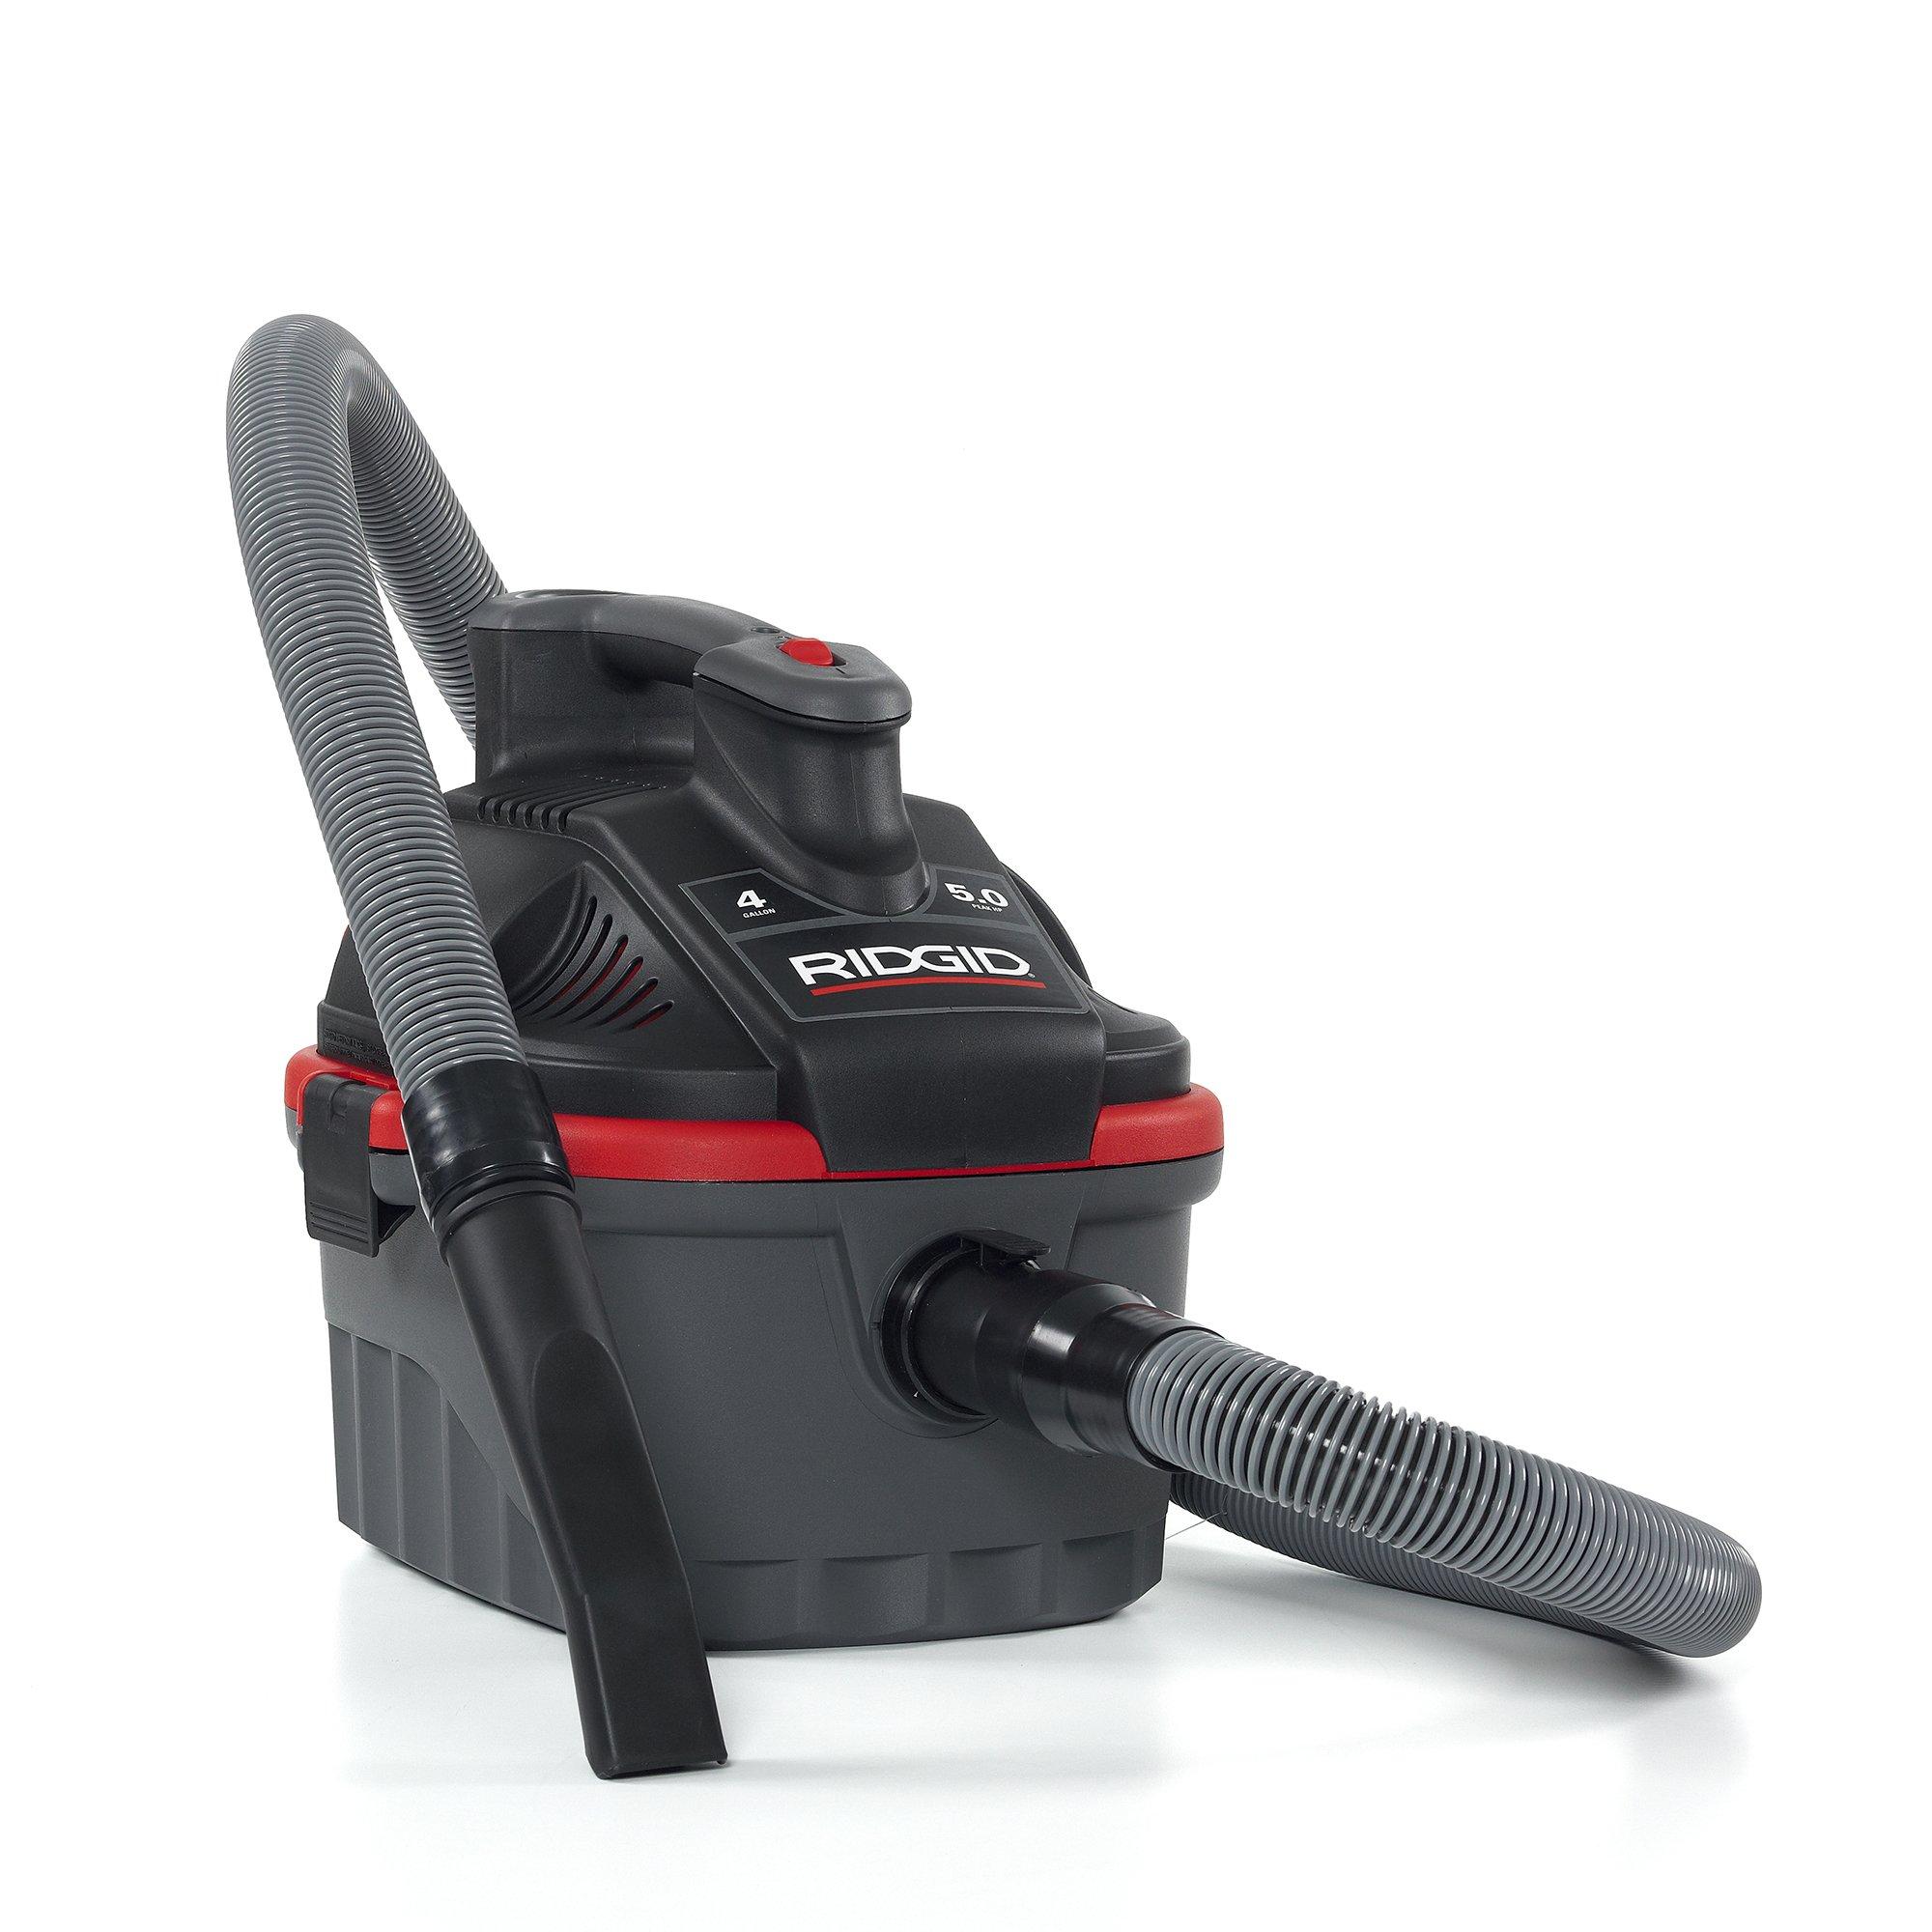 RIDGID 50313 4000RV Portable Wet Dry Vacuum, 4-Gallon Small Wet Dry Vac with 5.0 Peak HP Motor, Pro Hose, Ergonomic Handle, Cord Wrap, Blower Port by Ridgid (Image #3)